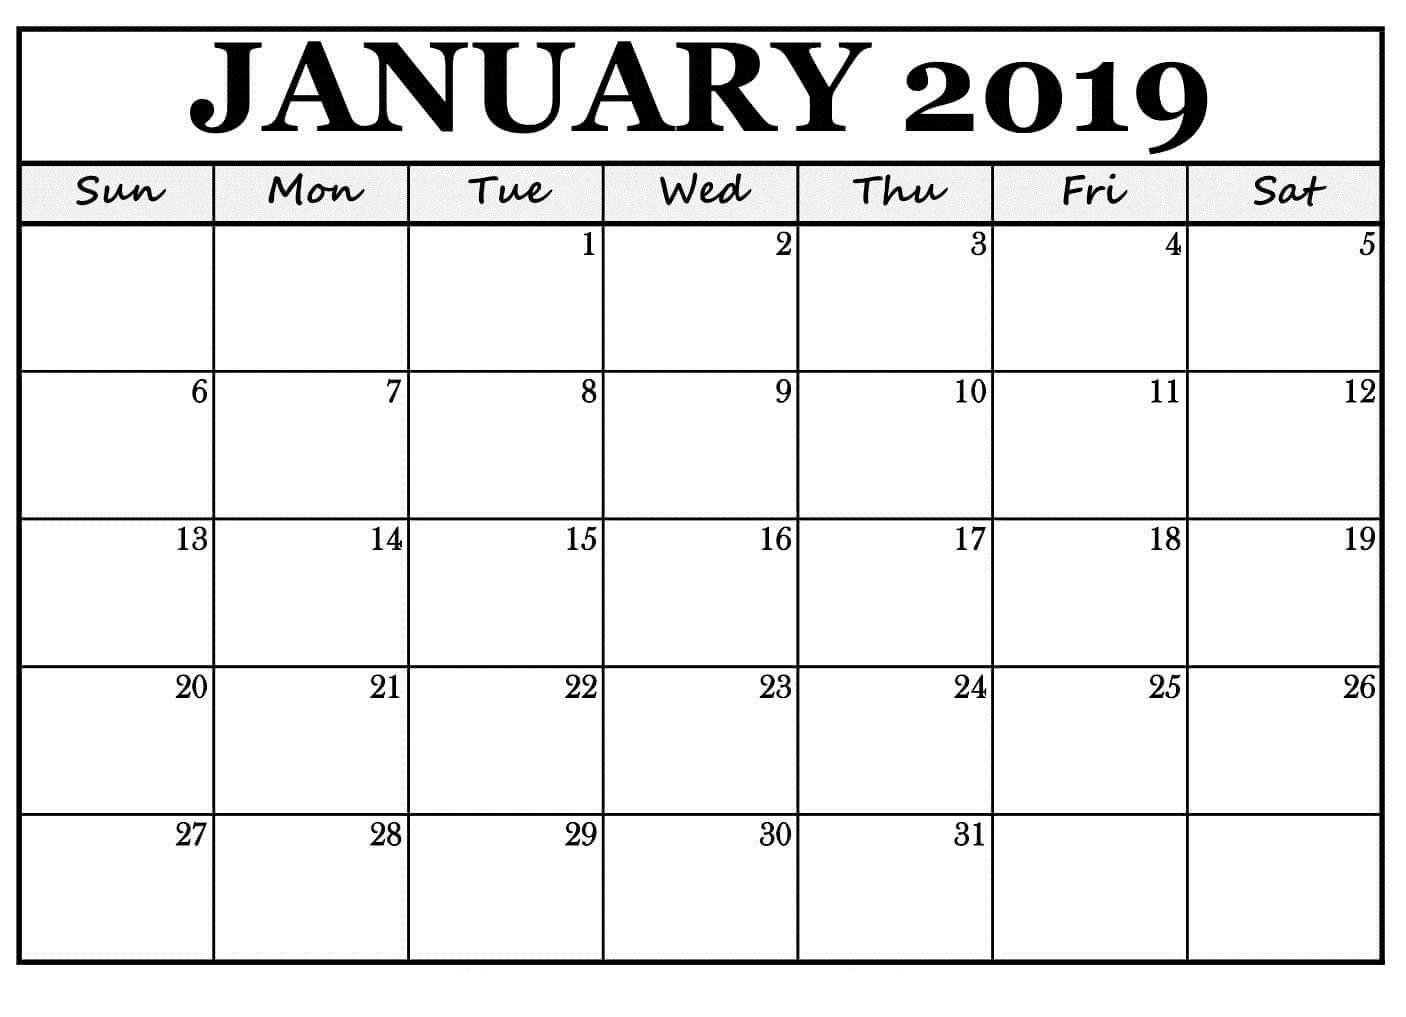 January 2019 Calendar Reminders Free Template   January 2019 Calendar 2019 January Printable